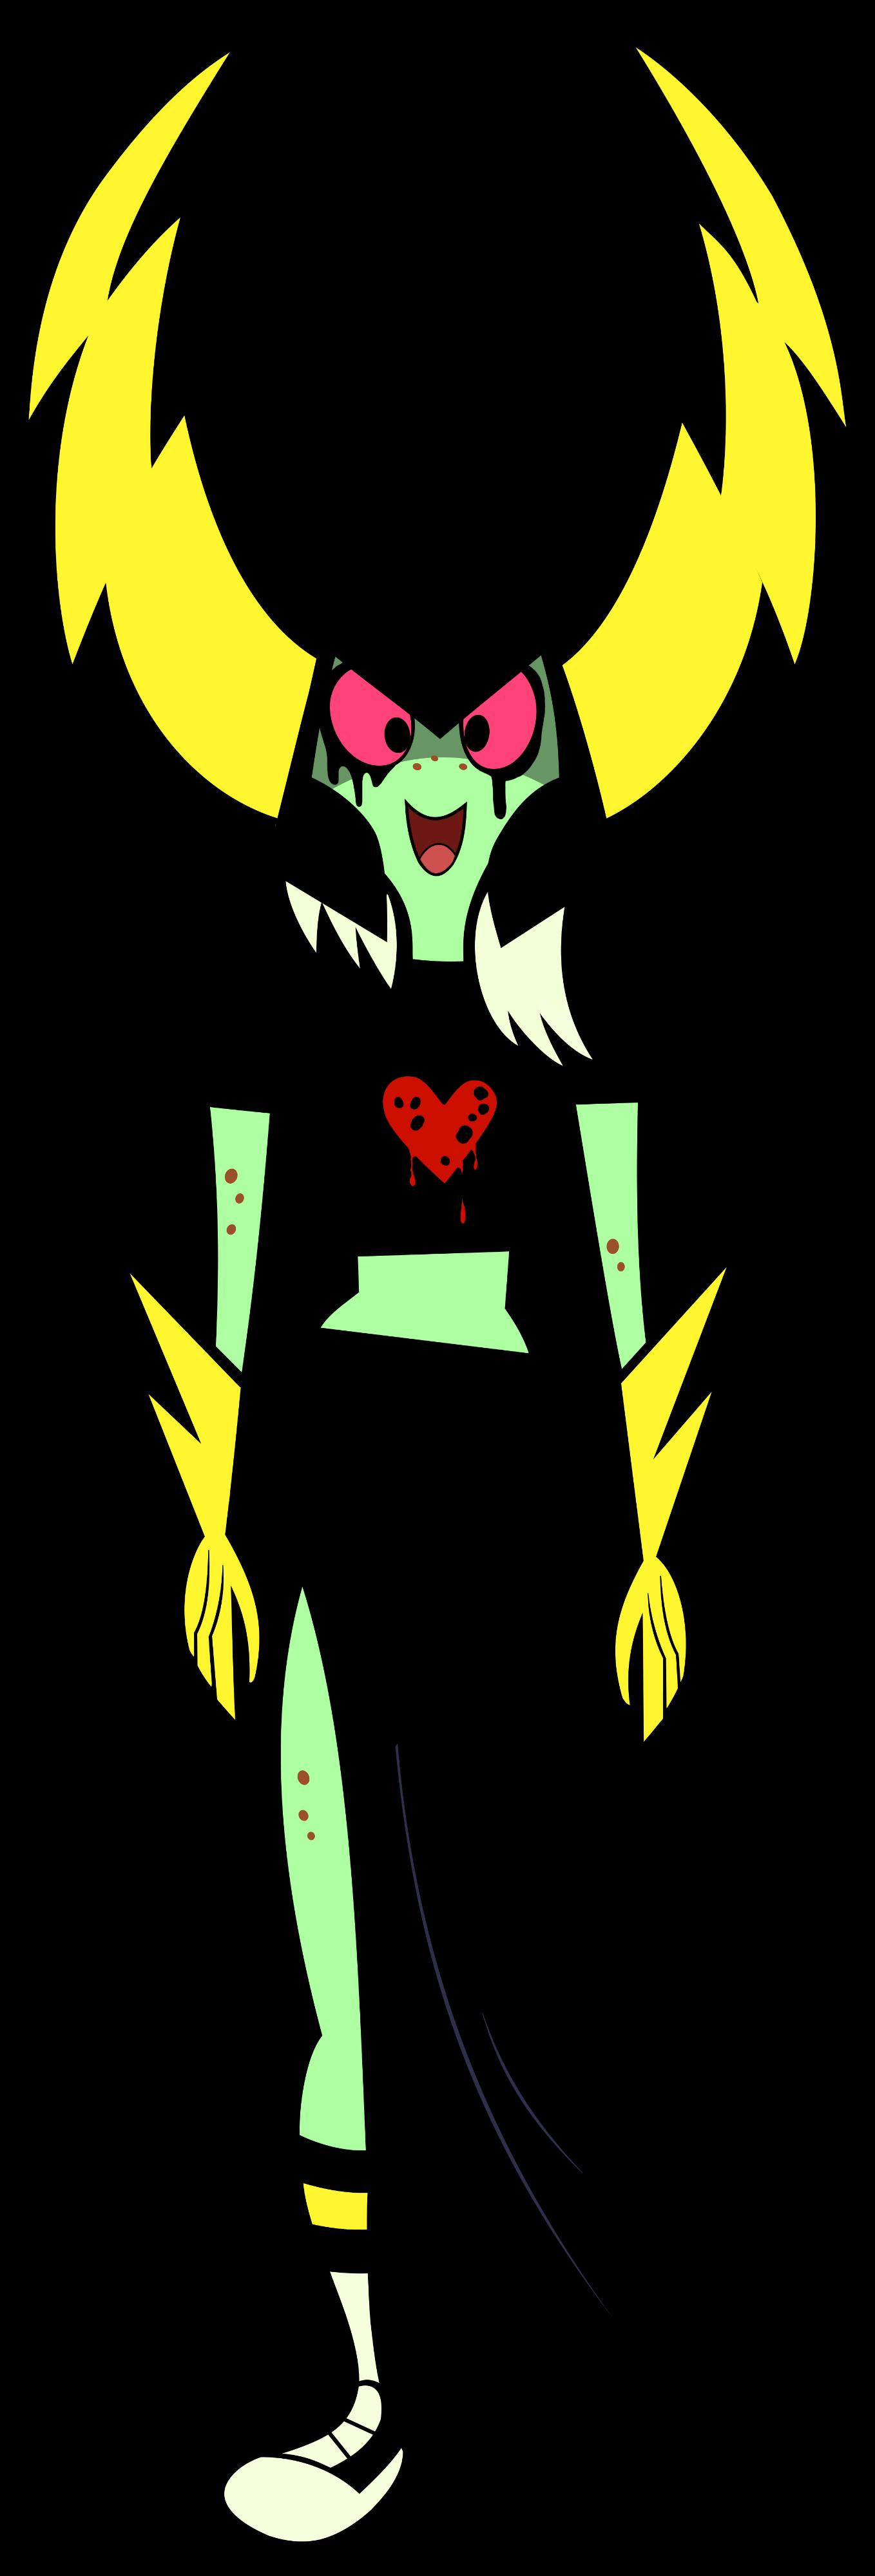 Лорд Доминатор (скриншот персонажа)